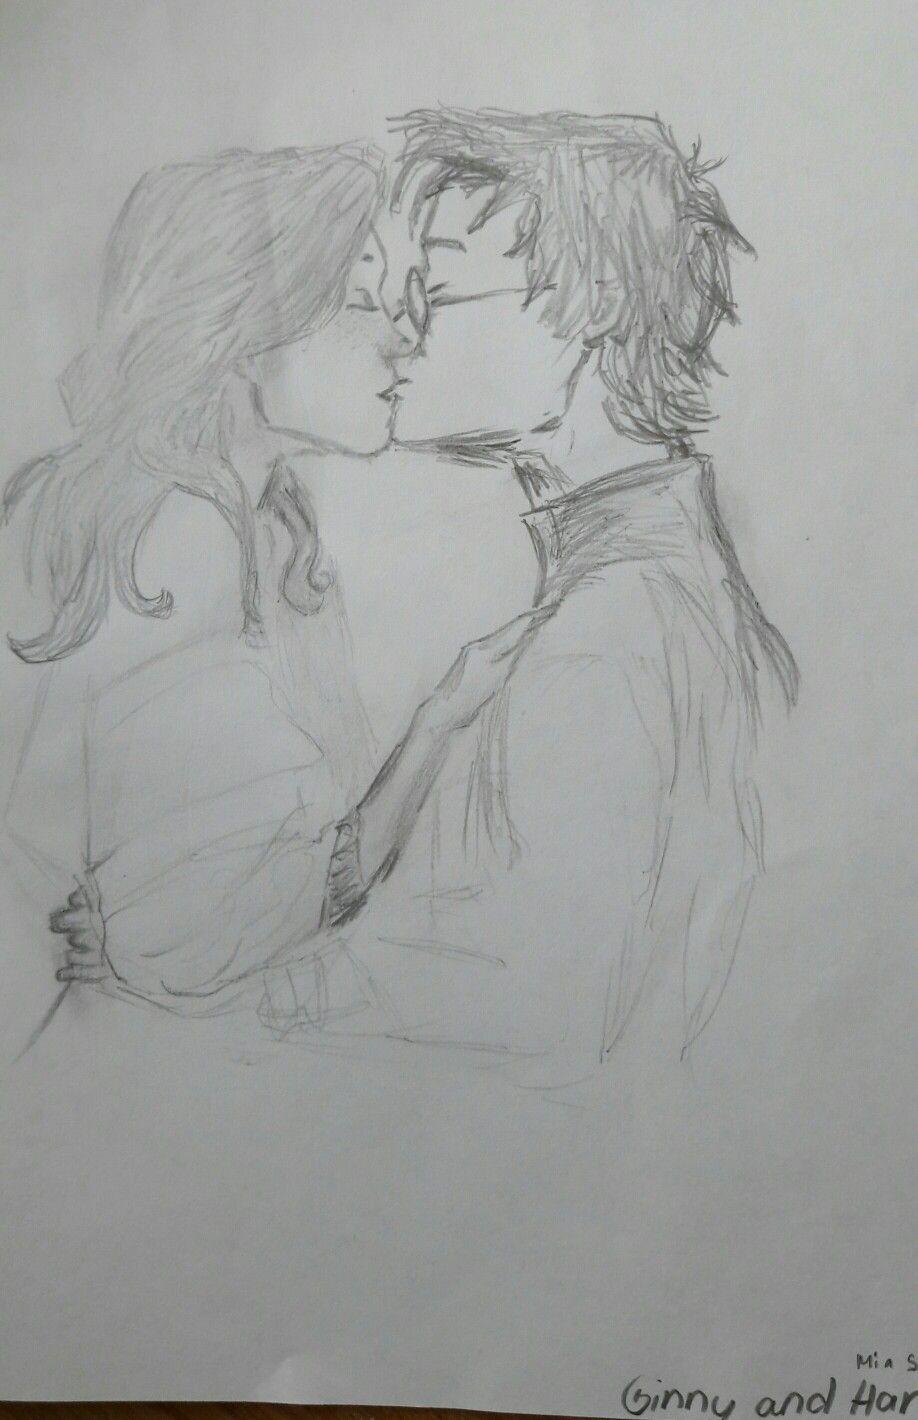 My art harry ginny harrypotter sketch pencils handmade